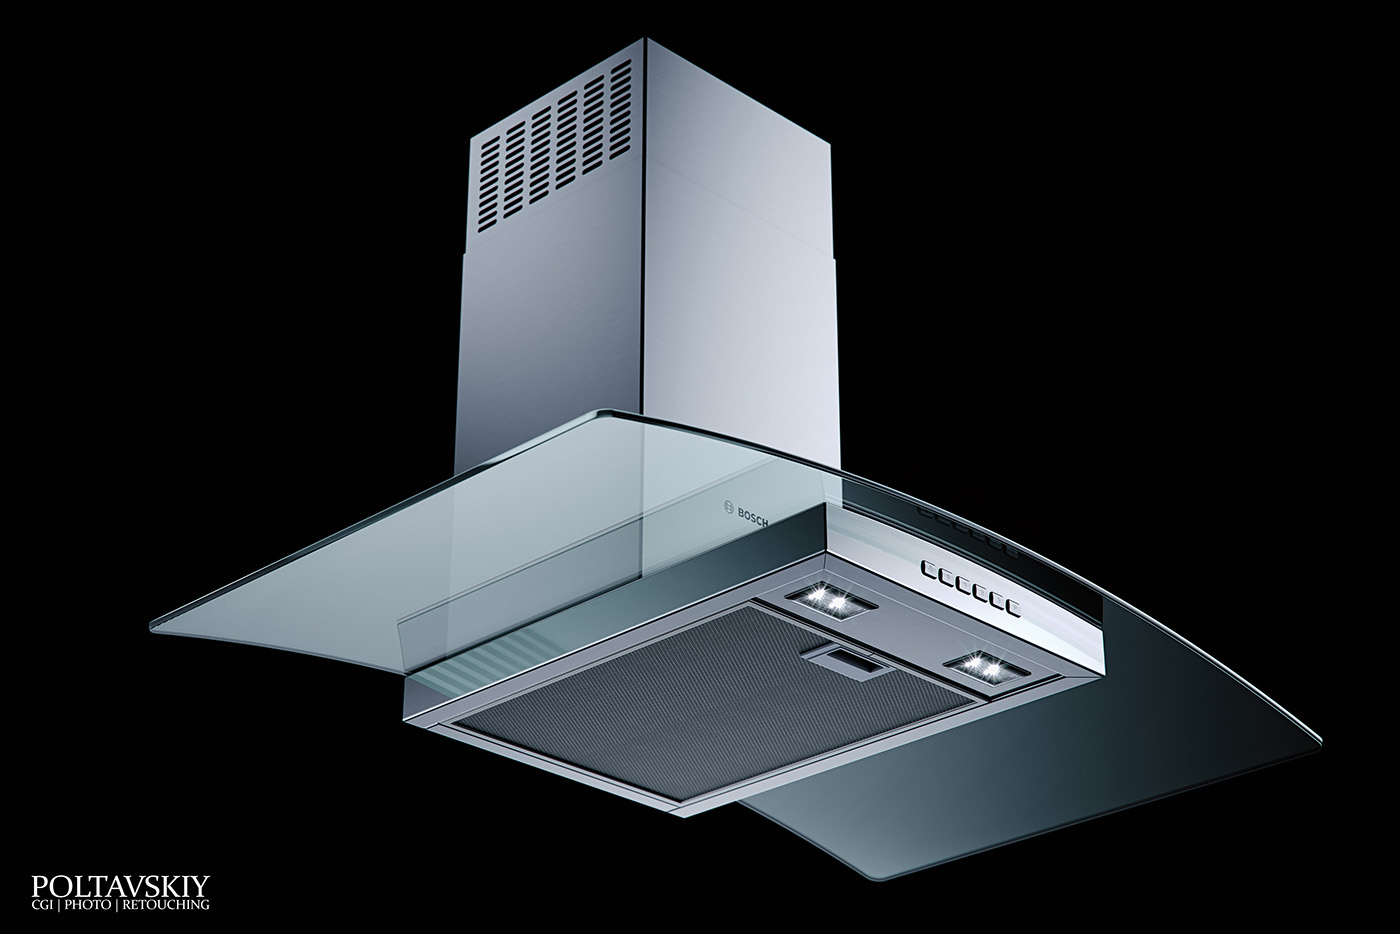 Bosch Glass Hood - CGI & Retouching on Behance